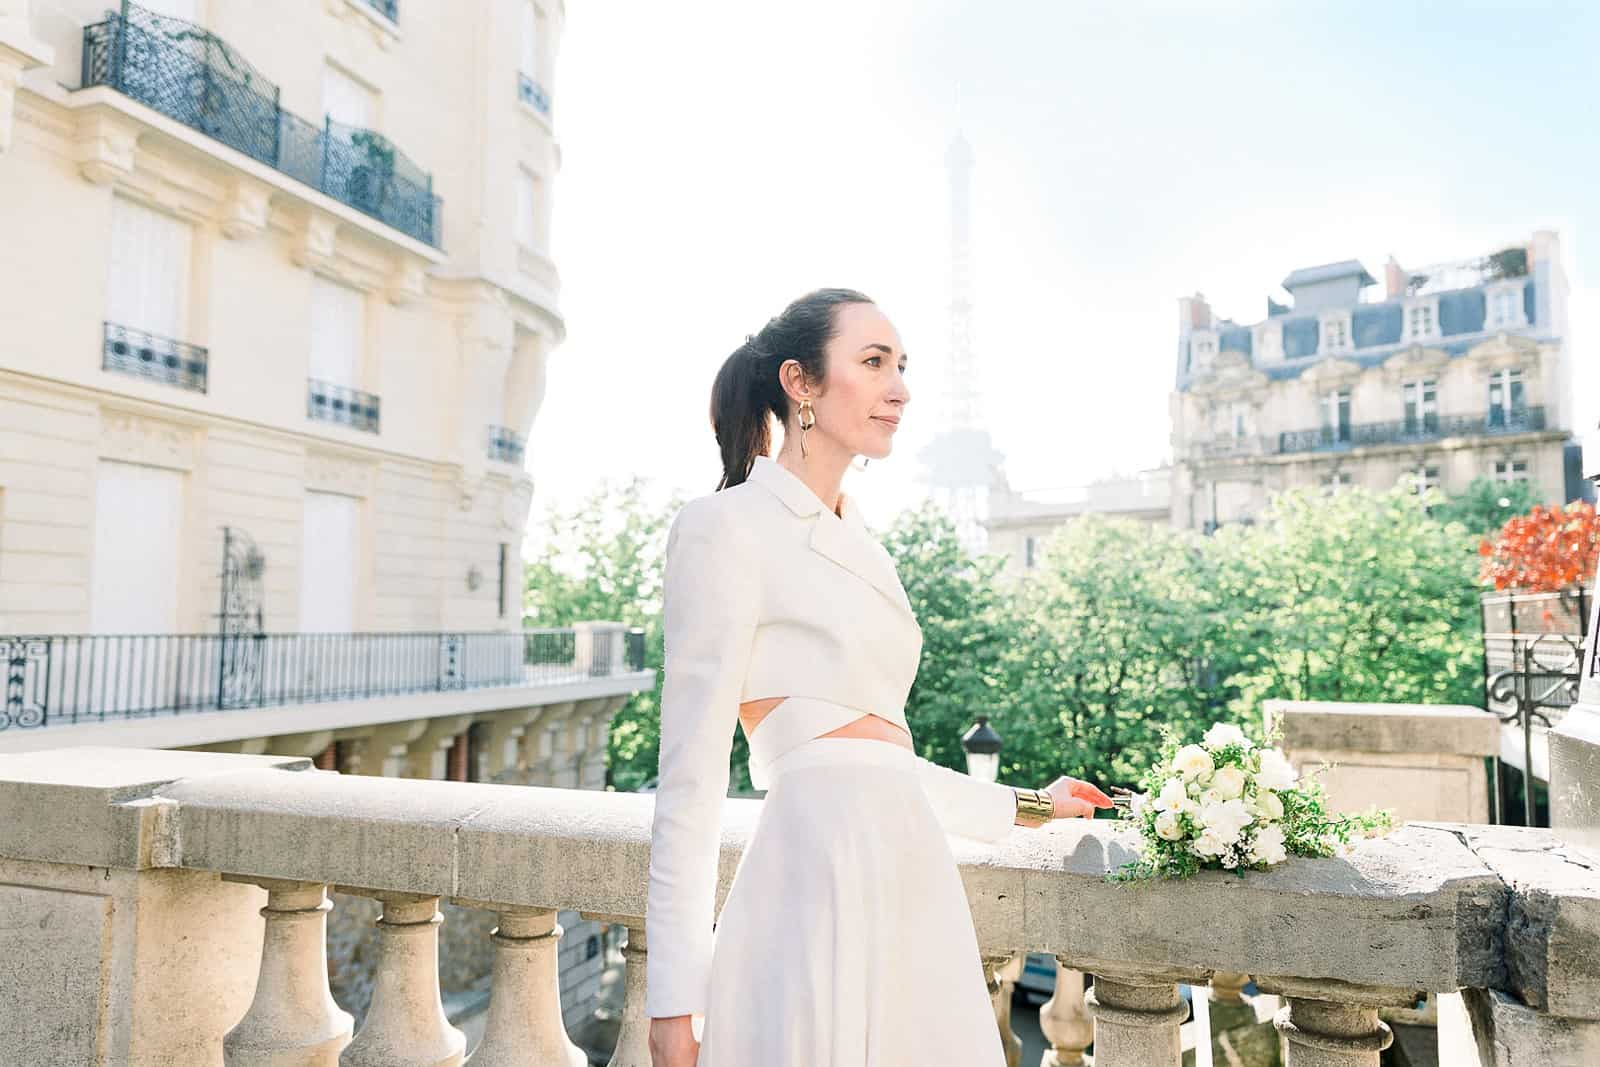 Modern high fashion bride in Paris, France